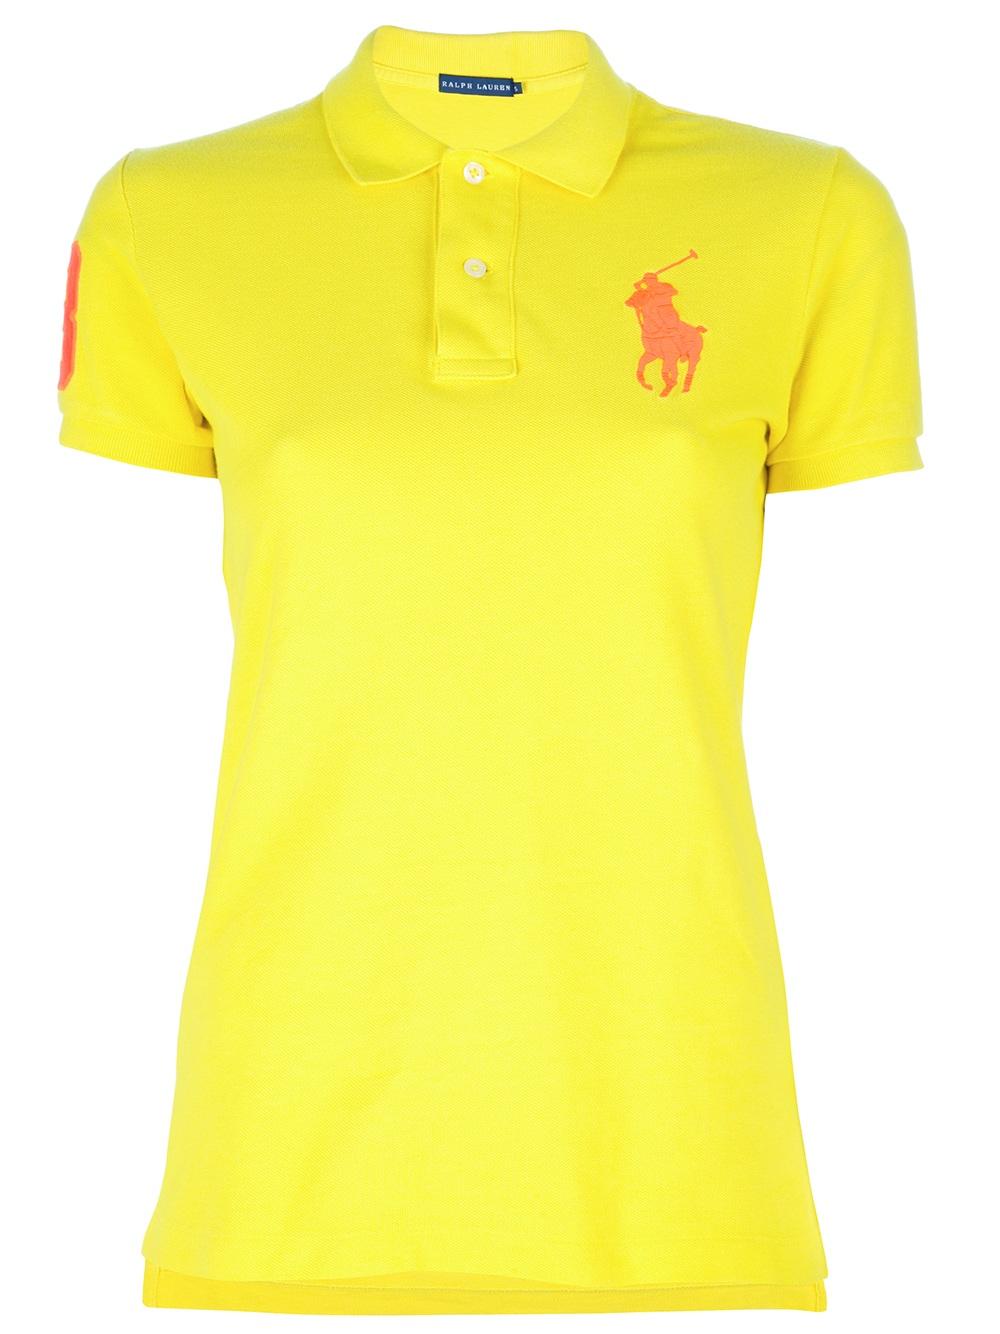 Ralph lauren blue label polo shirt in yellow lyst for Ralph lauren black label polo shirt